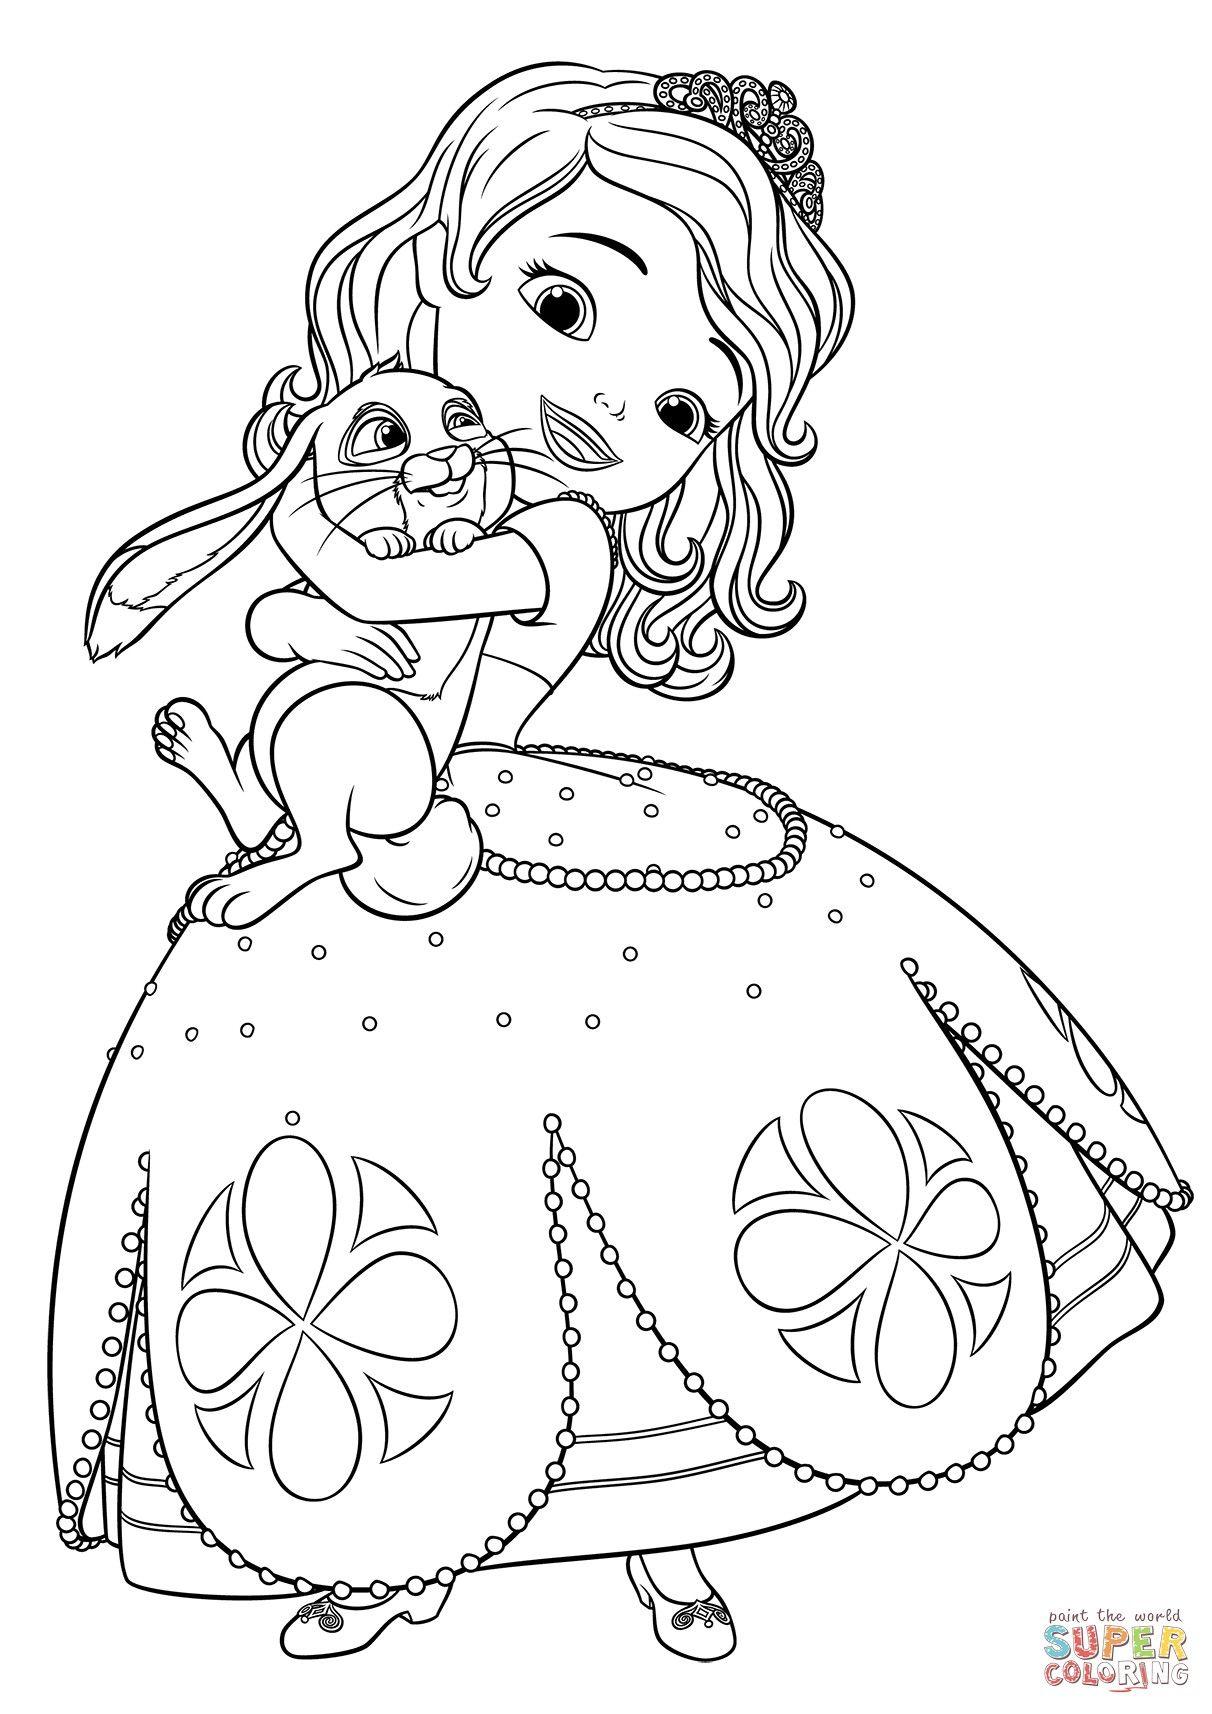 Free Printable Princess sofia Coloring Pages – Through the ... | princess sofia coloring pages